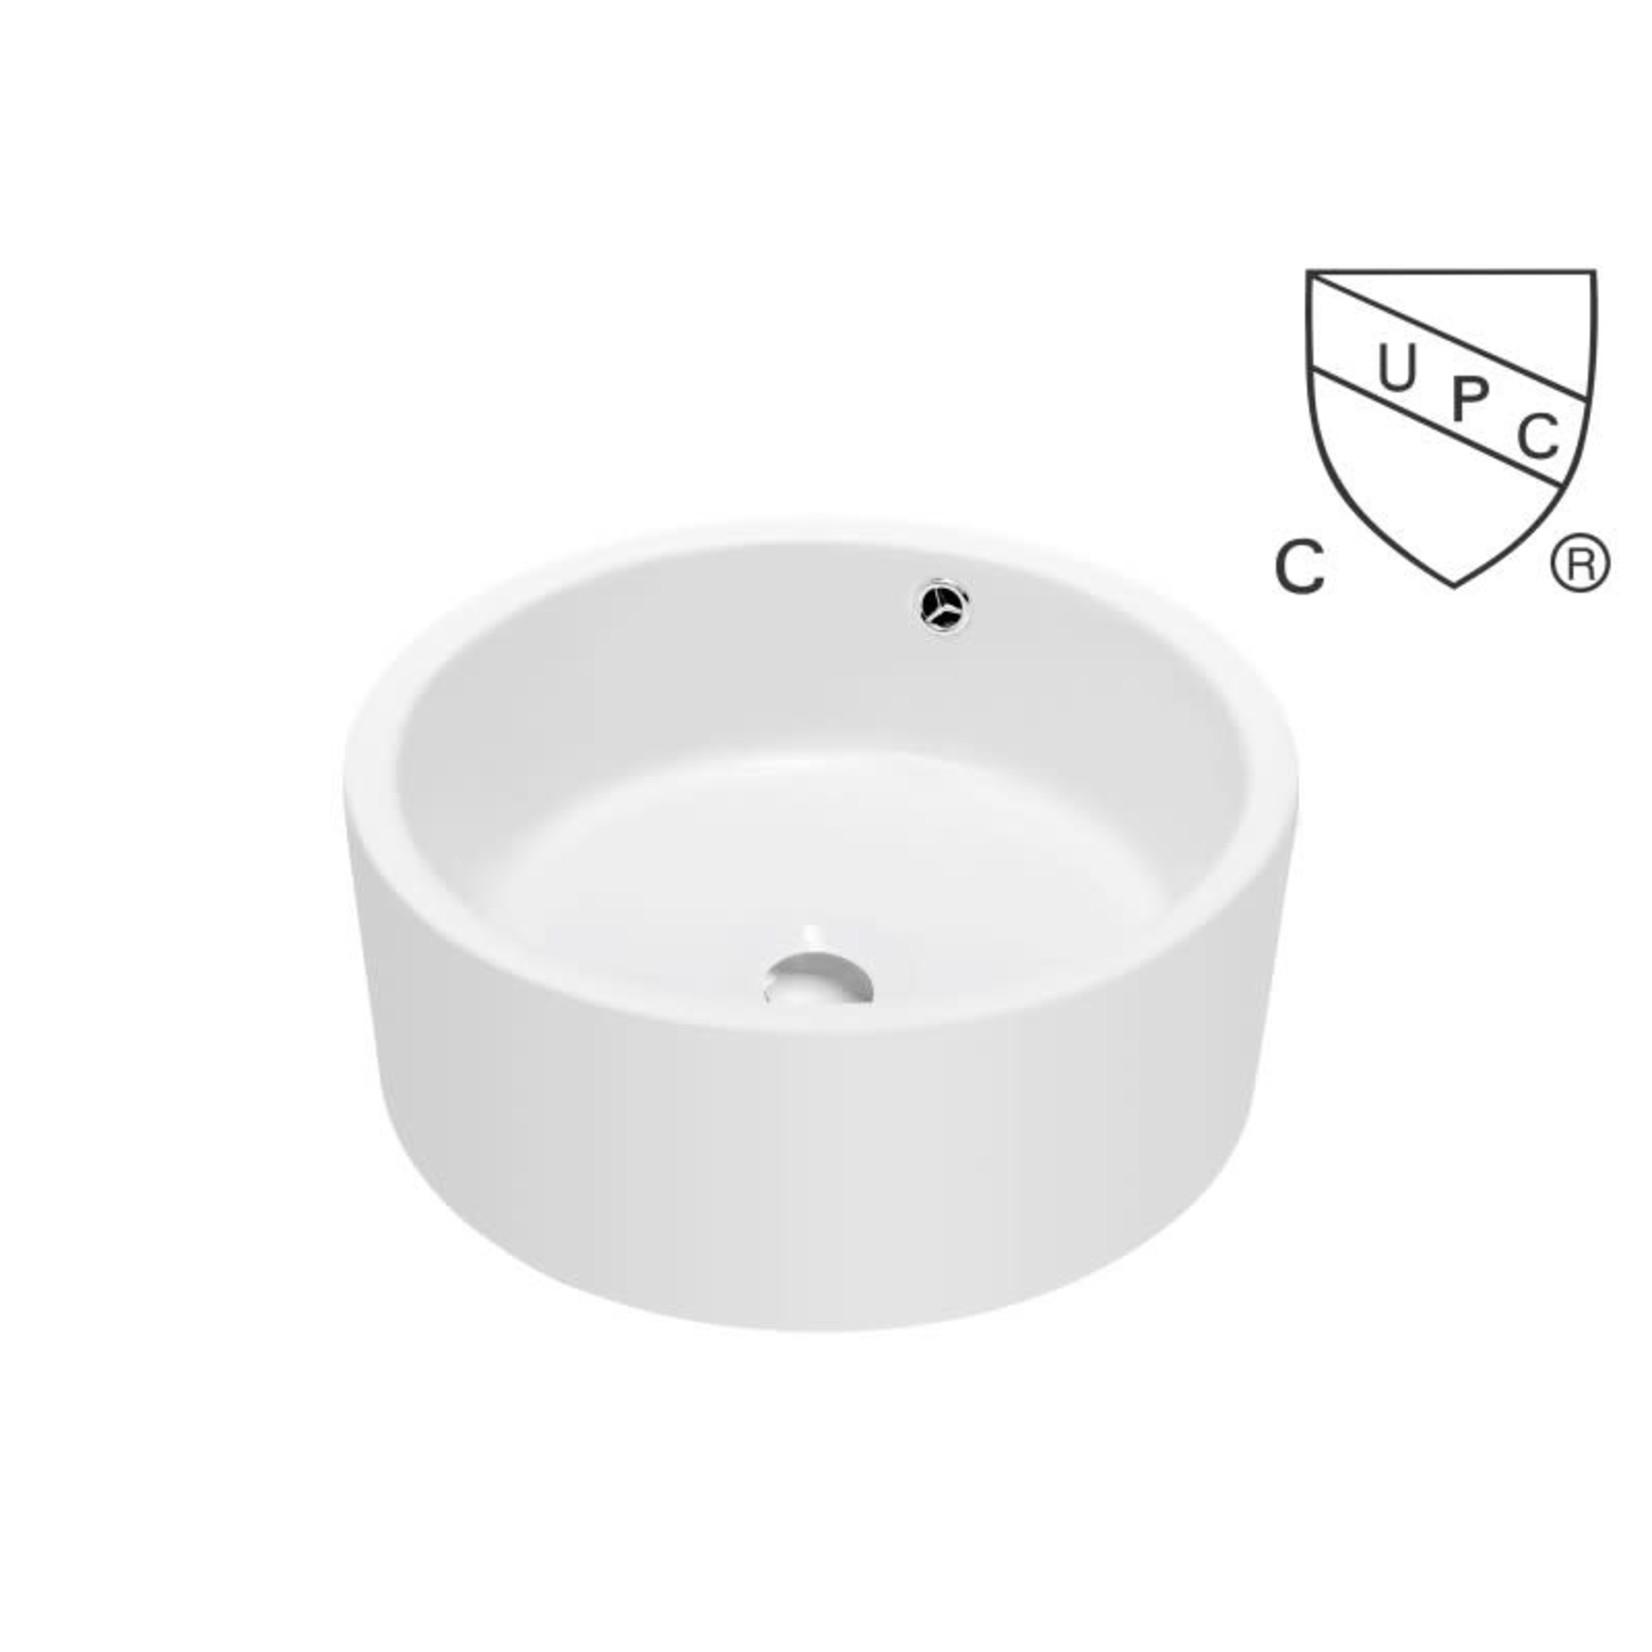 White porcelain basin DI-134537